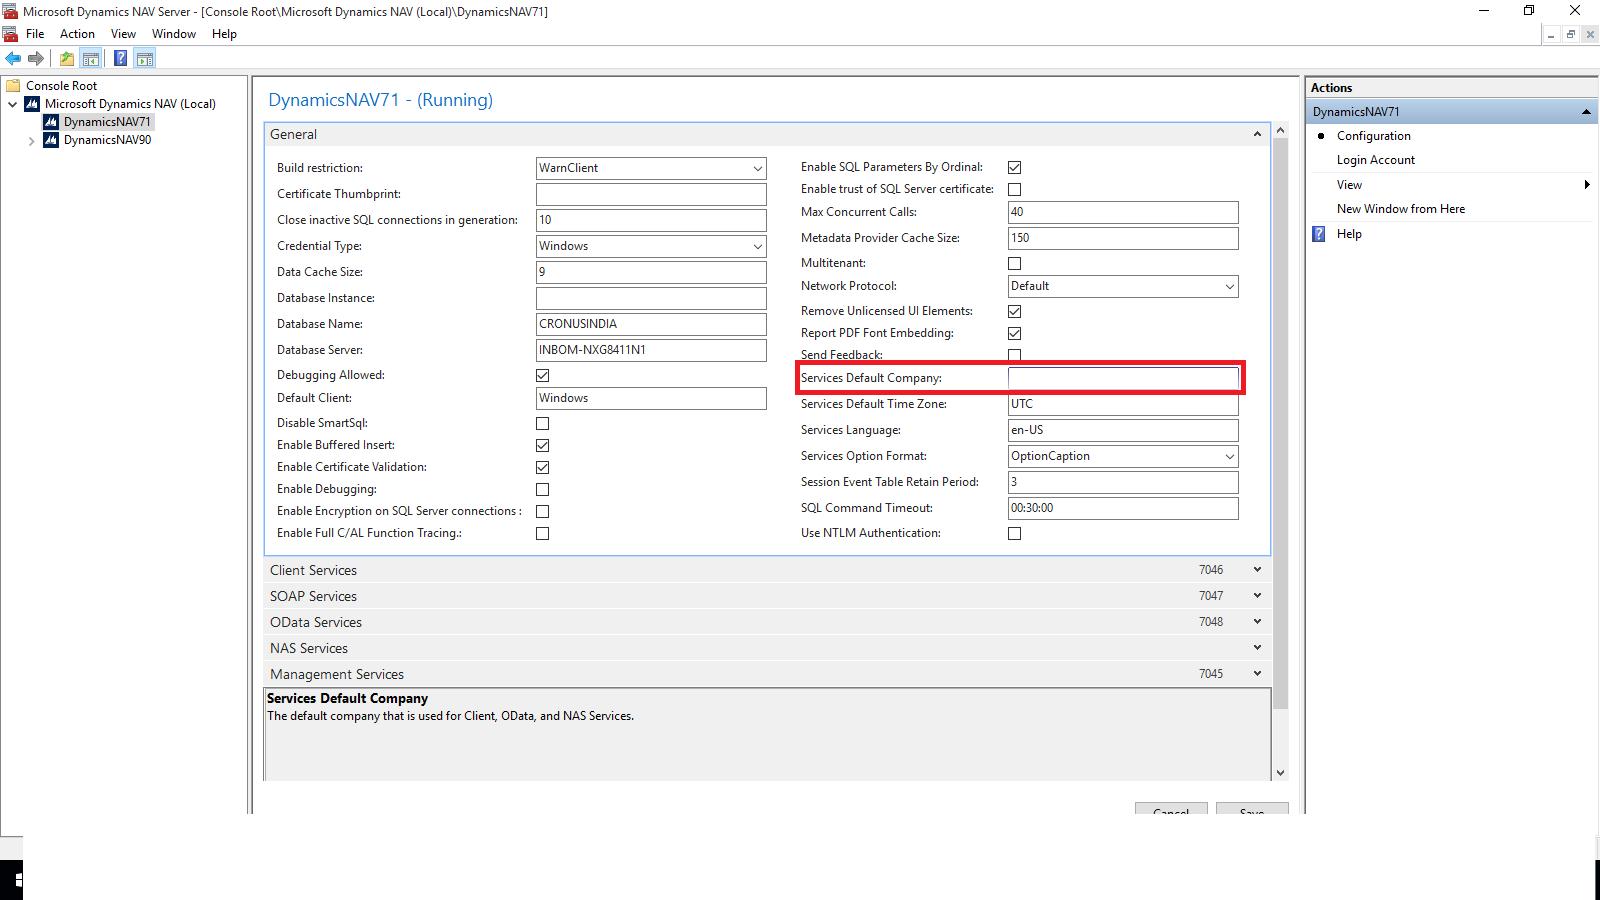 Nandesh gowda default company when using nav client odata nas microsoft dynamics nav 2013 r2 administration window 1betcityfo Images